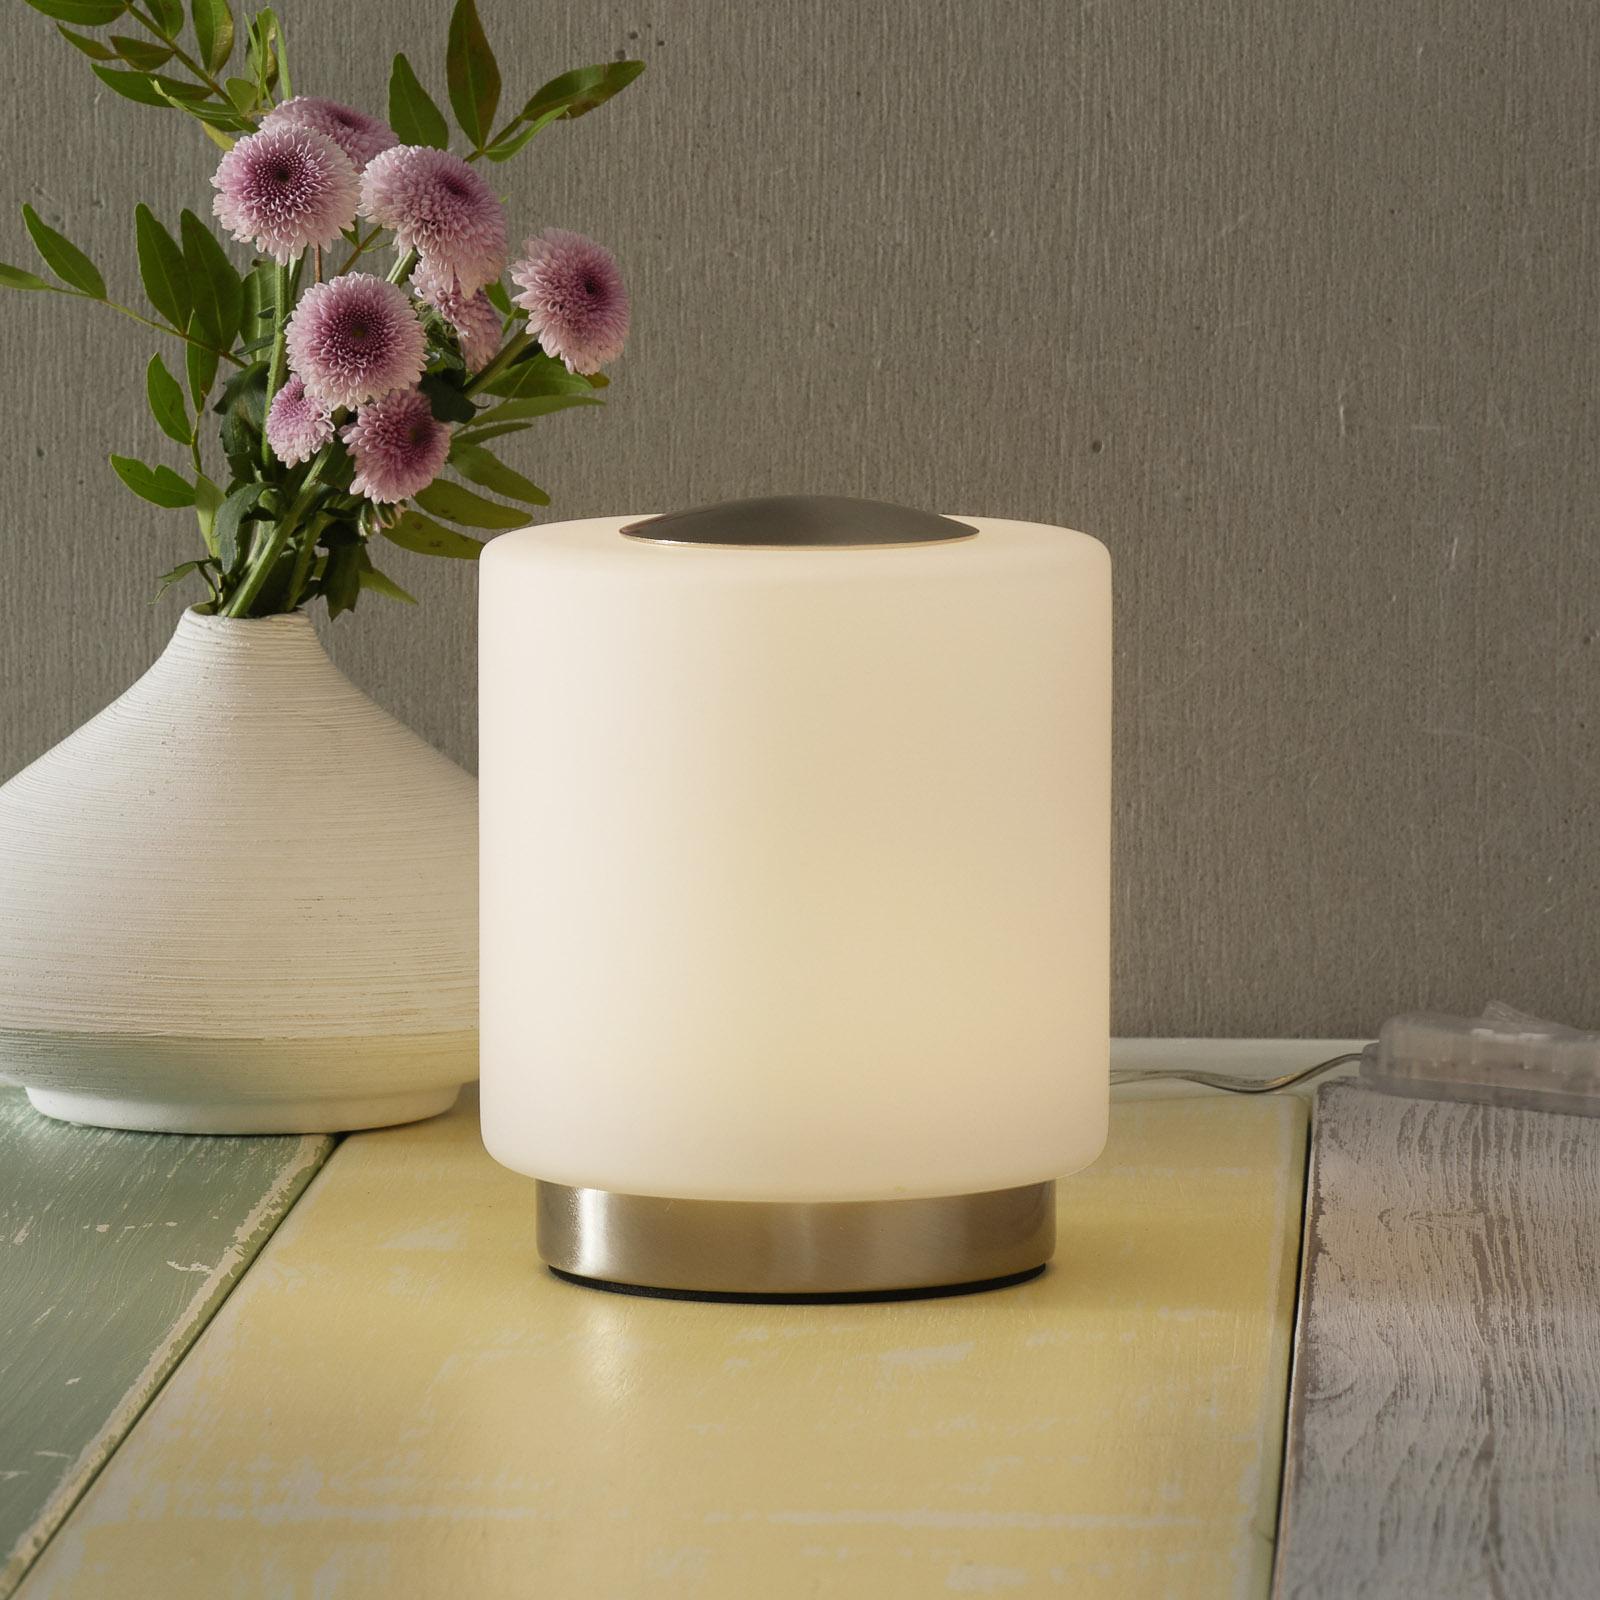 bordslampa led med touchfunktion